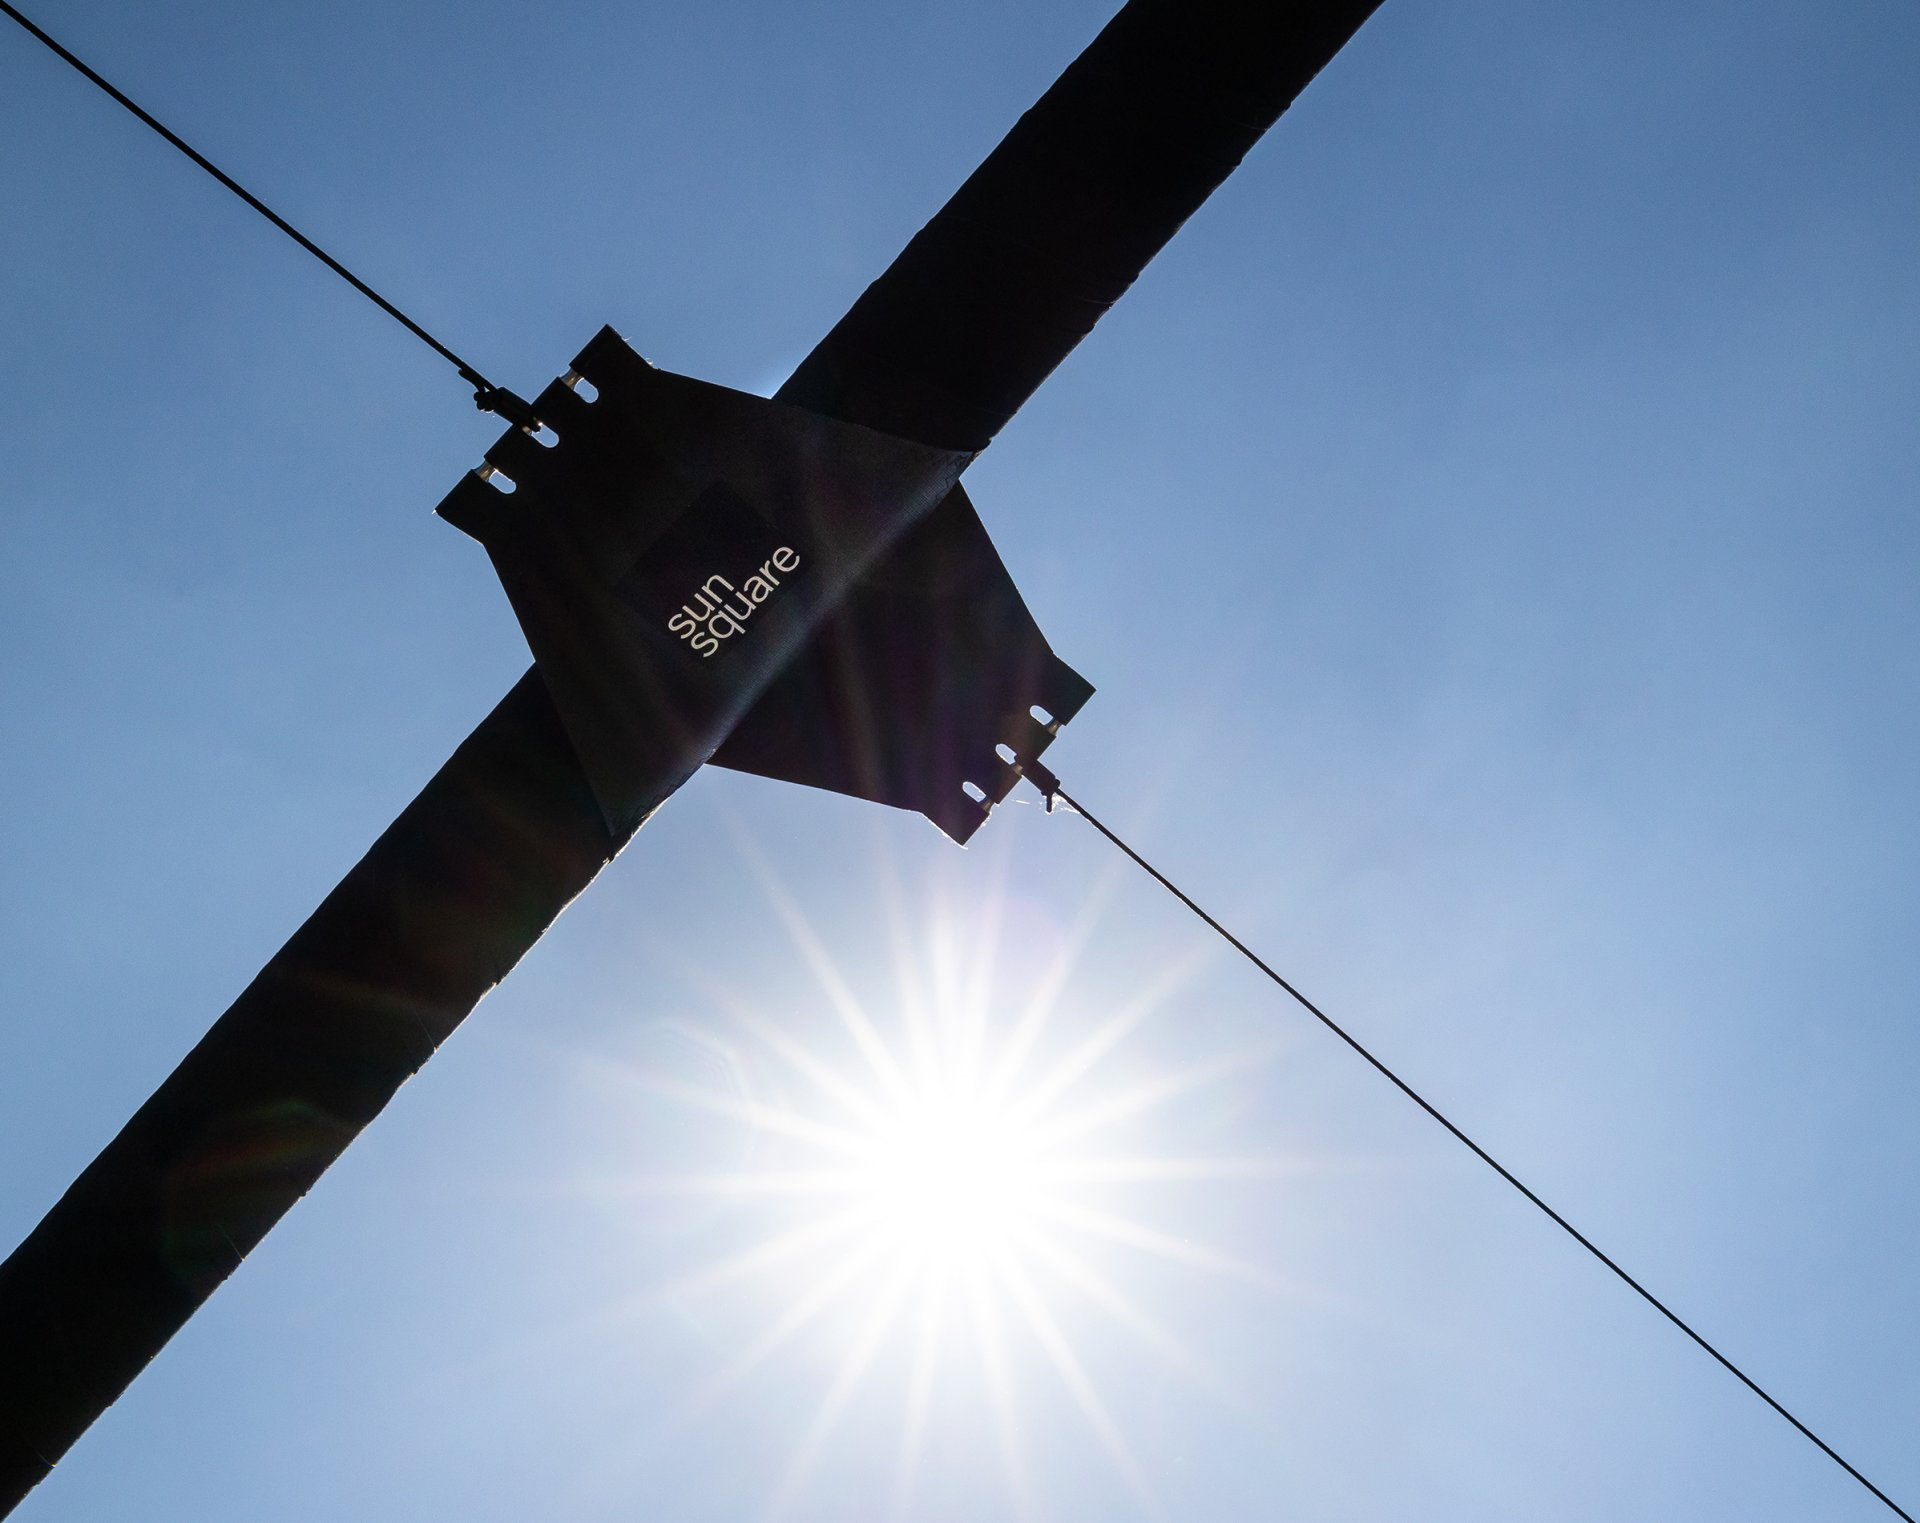 SunSquare Sonnensegel - Dachterrasse kramerundkramer